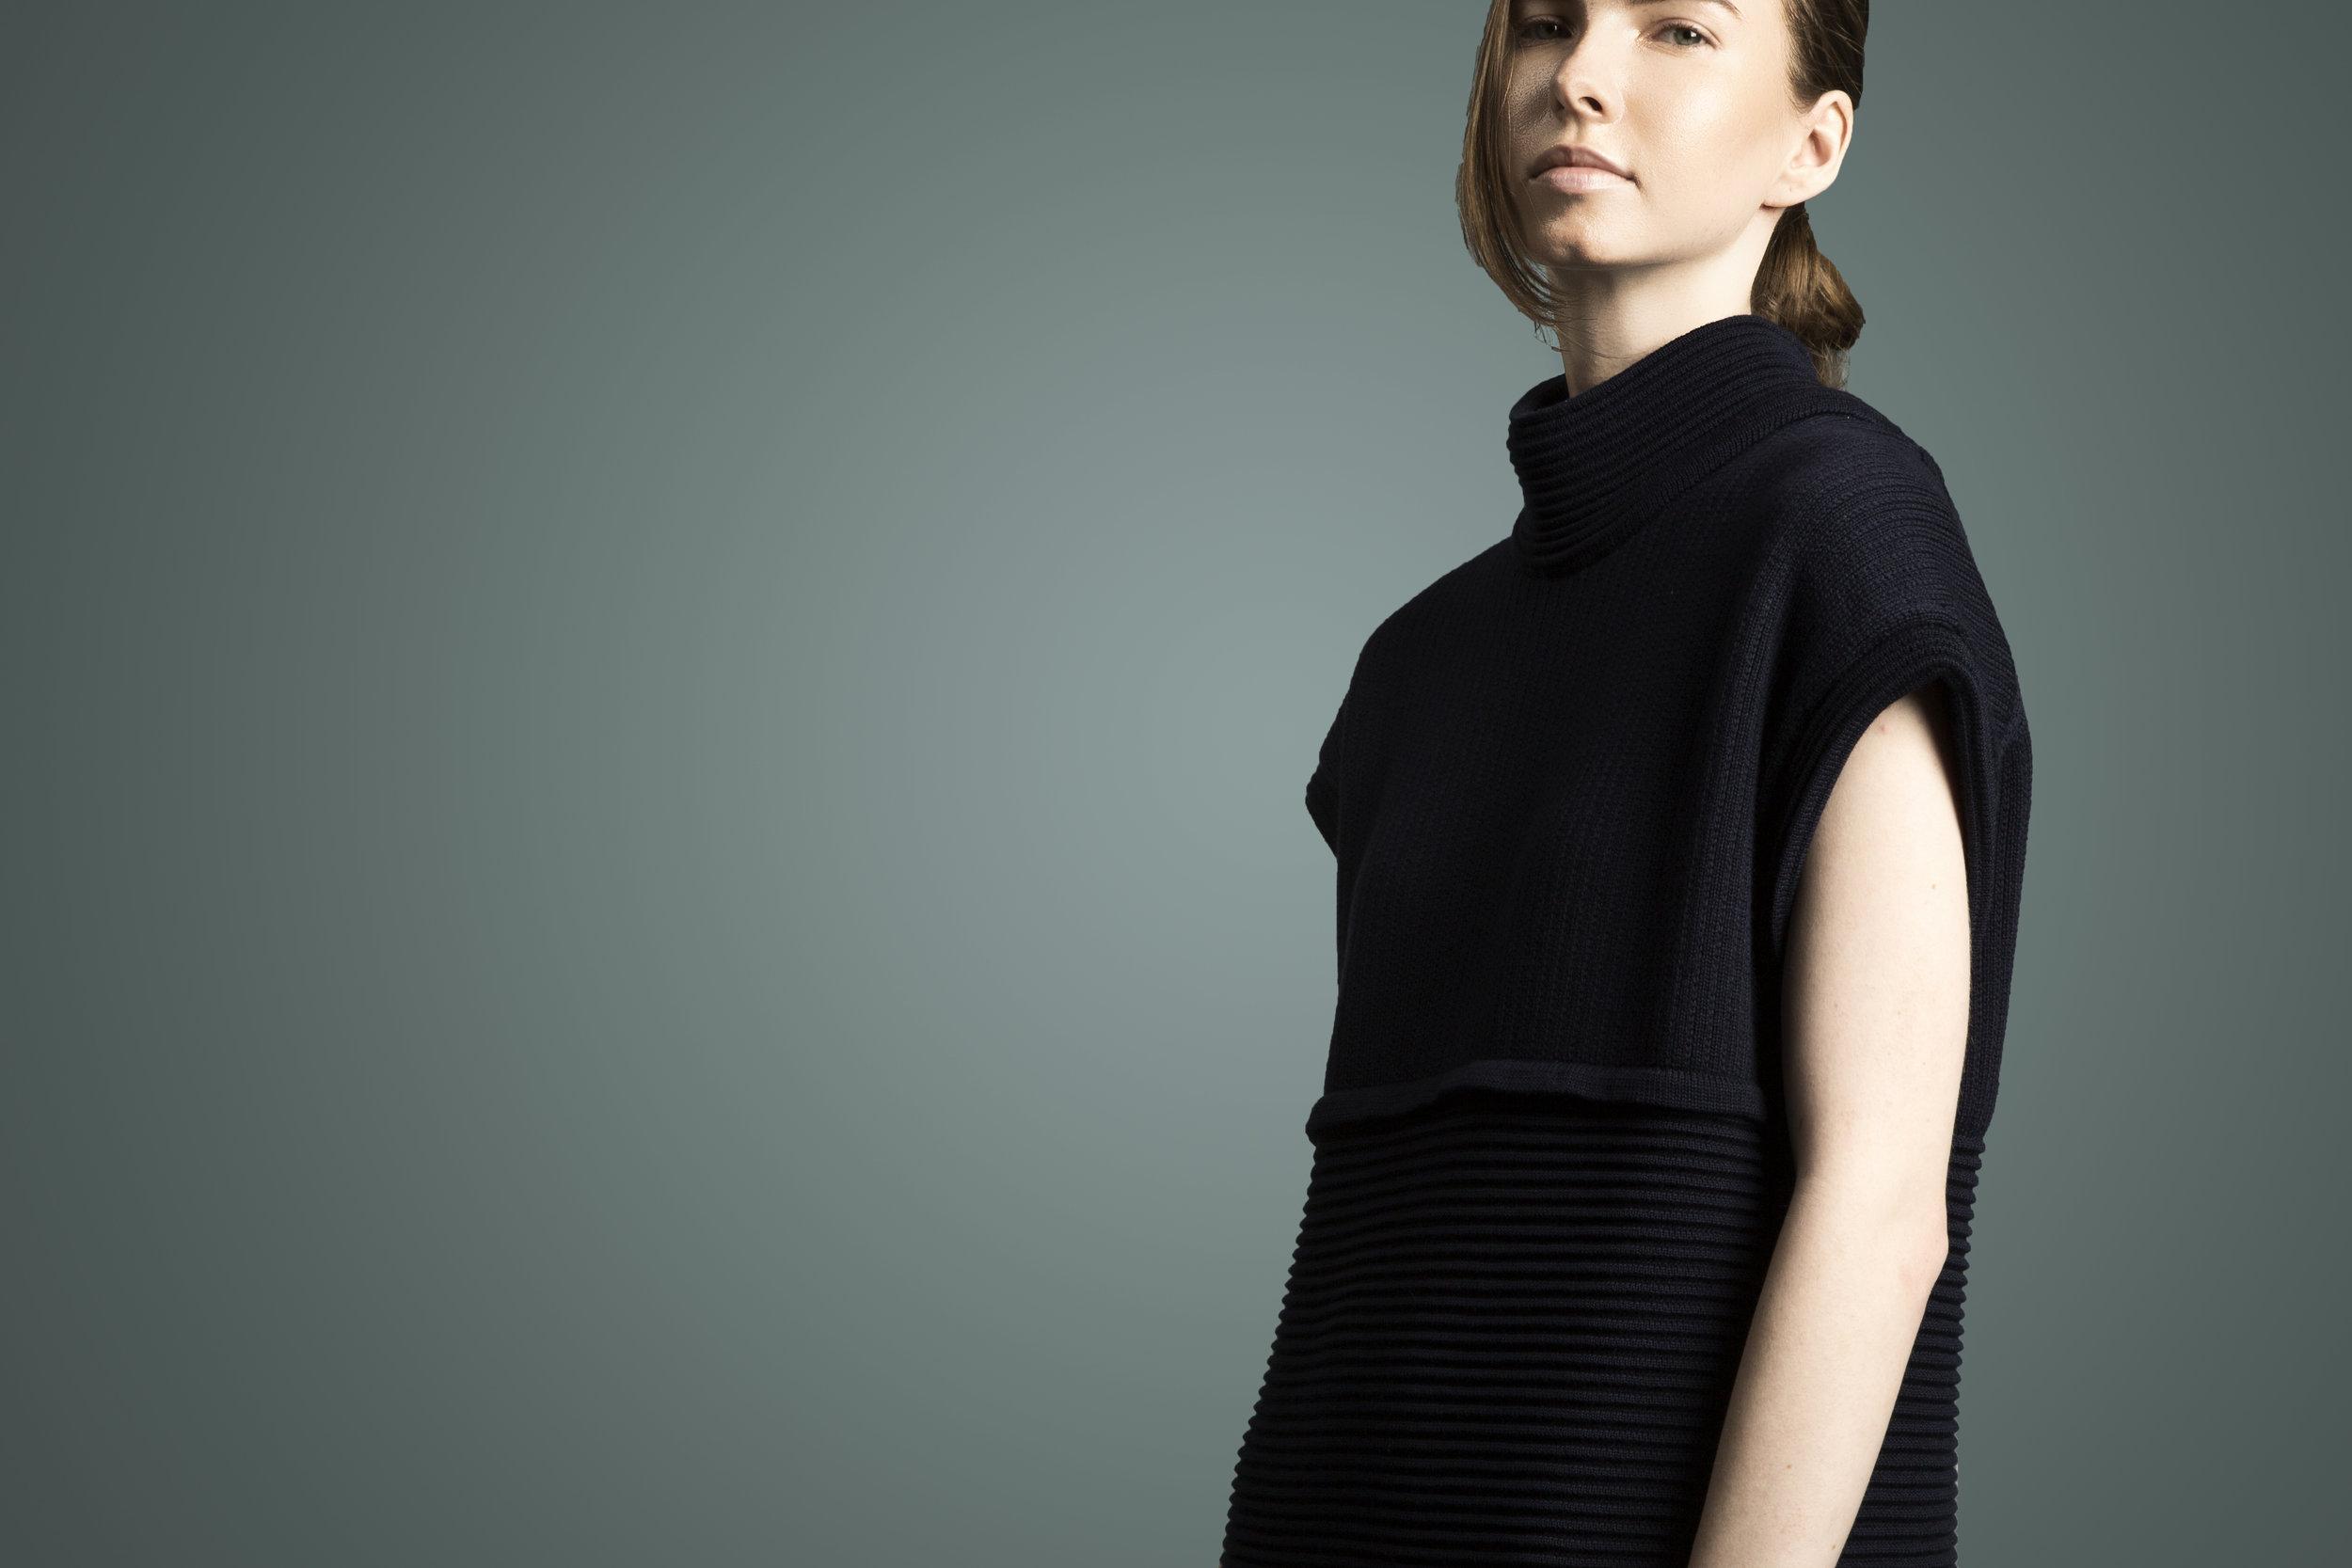 bom-kim-knitwear-bob-cut-2